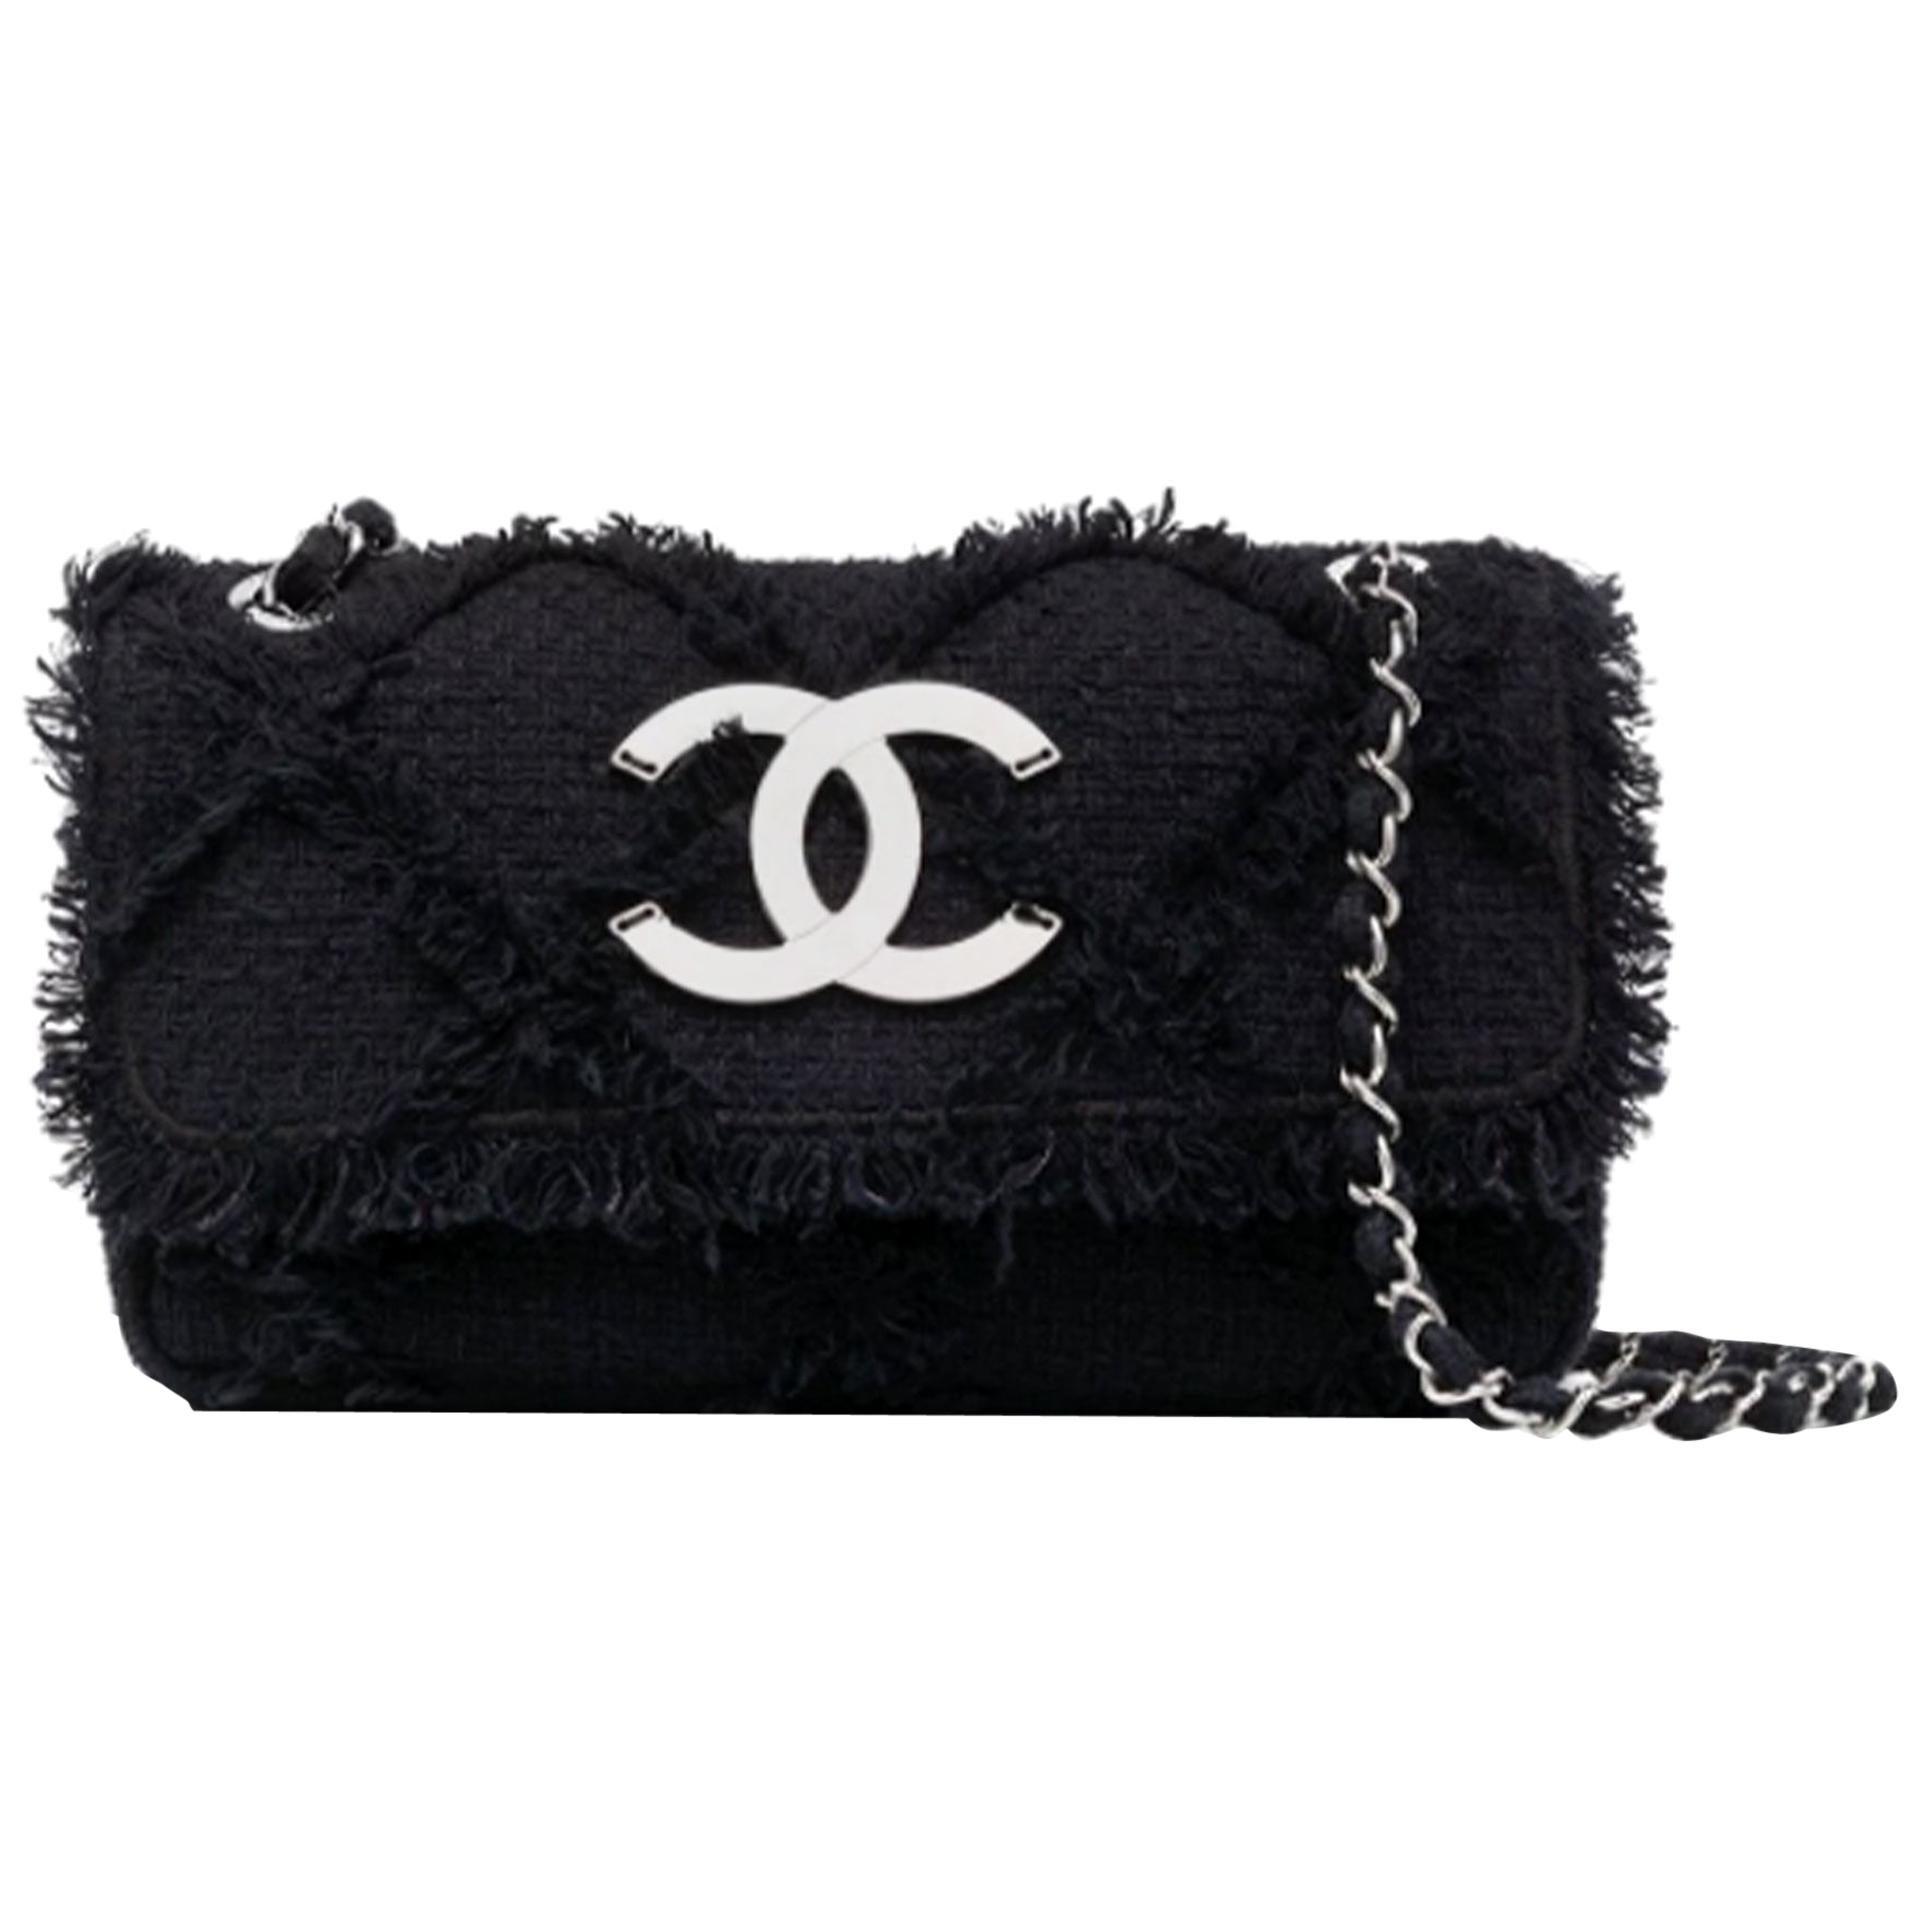 Chanel Black Medium Crochet Nature Tweed Fringe Classic Flap Bag